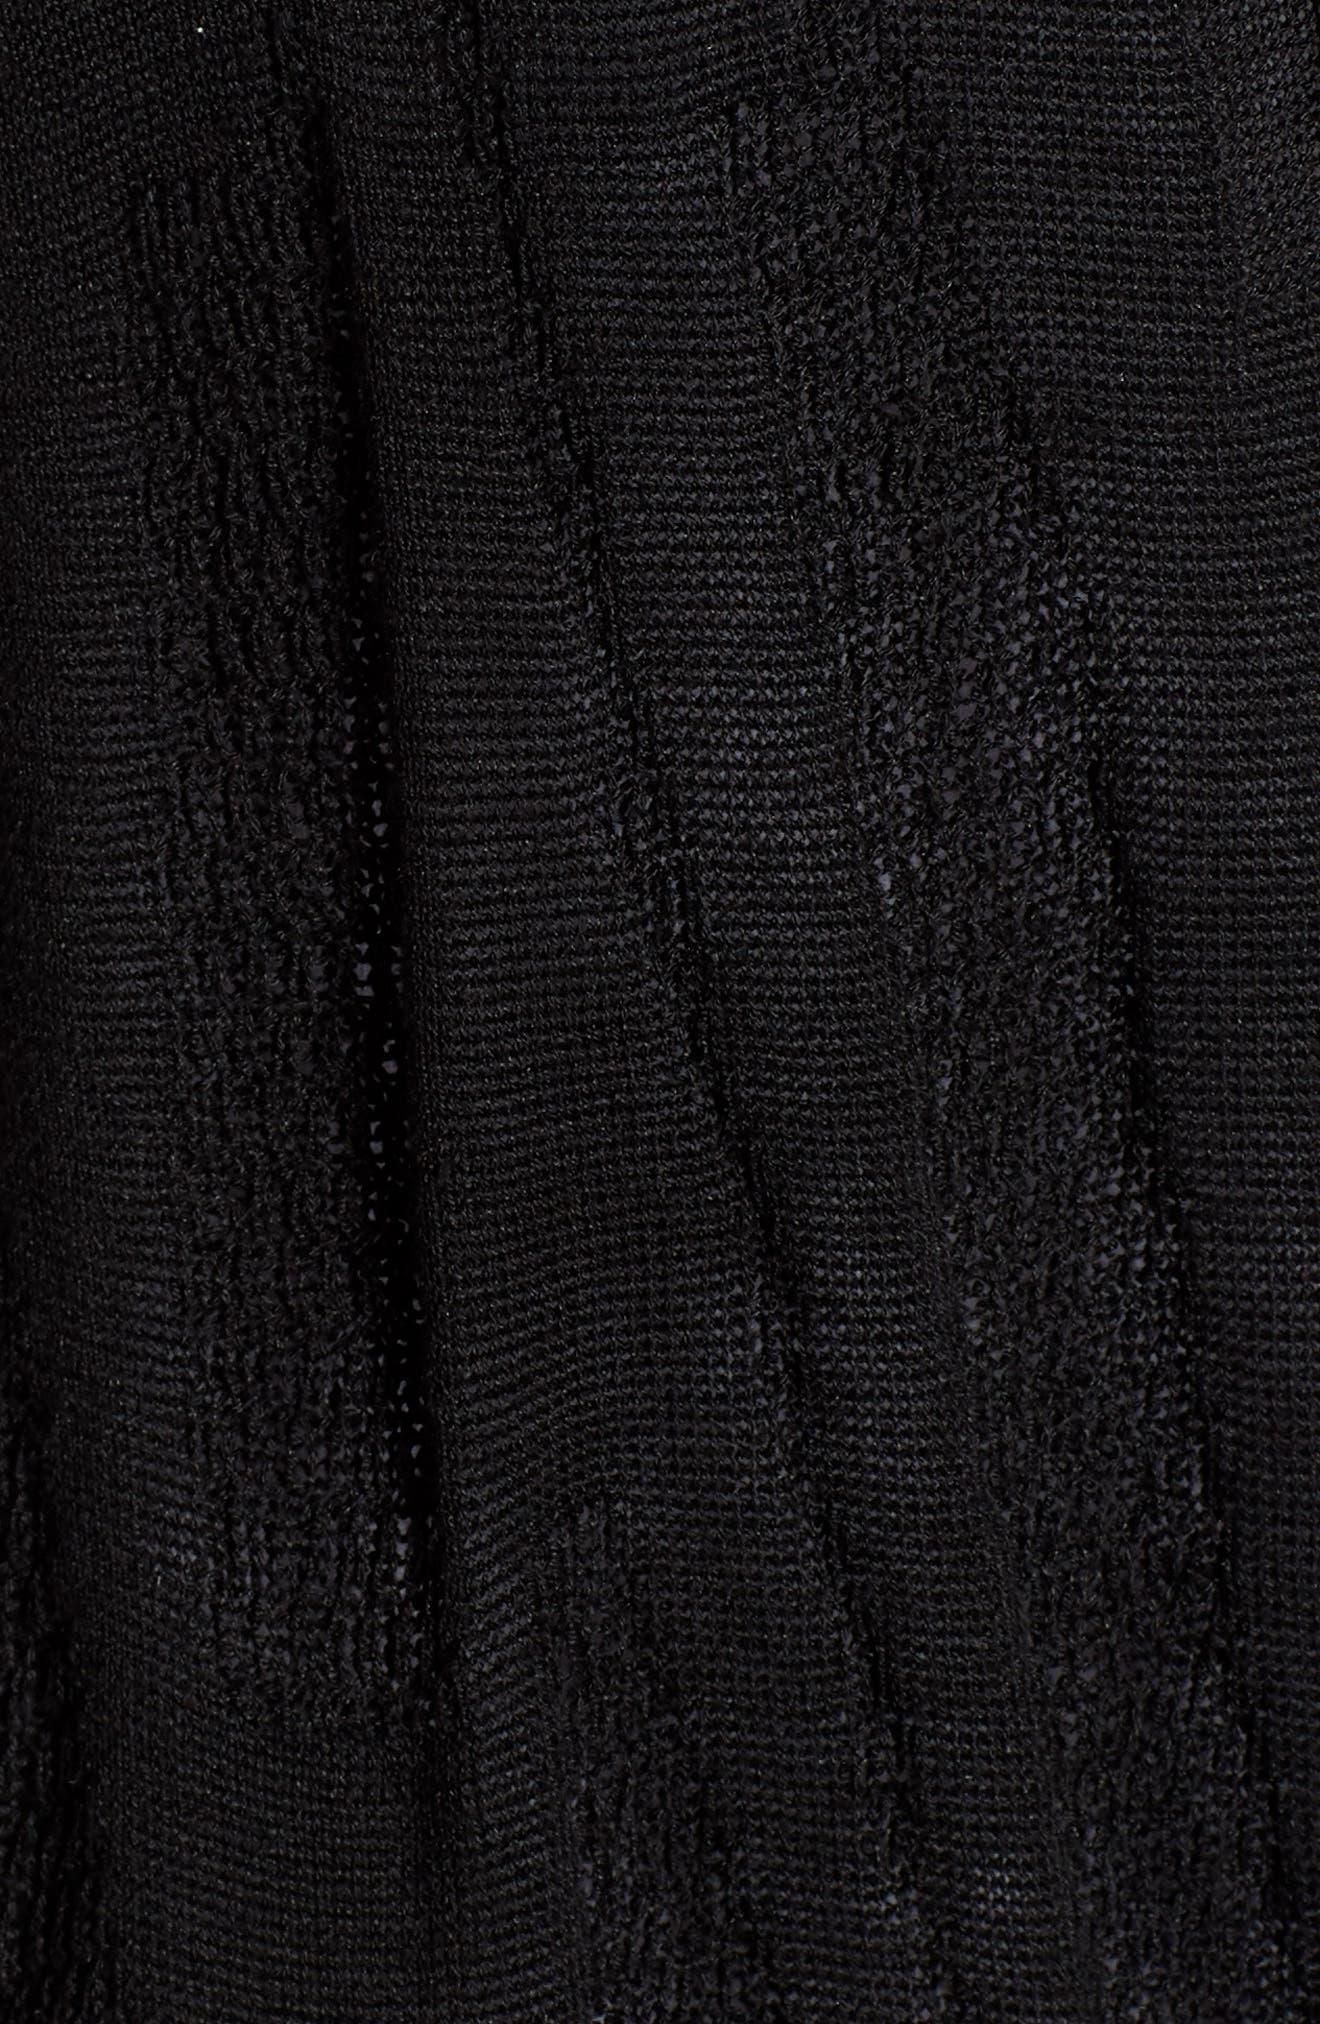 Simple Silk & Organic Linen Cardigan,                             Alternate thumbnail 5, color,                             001